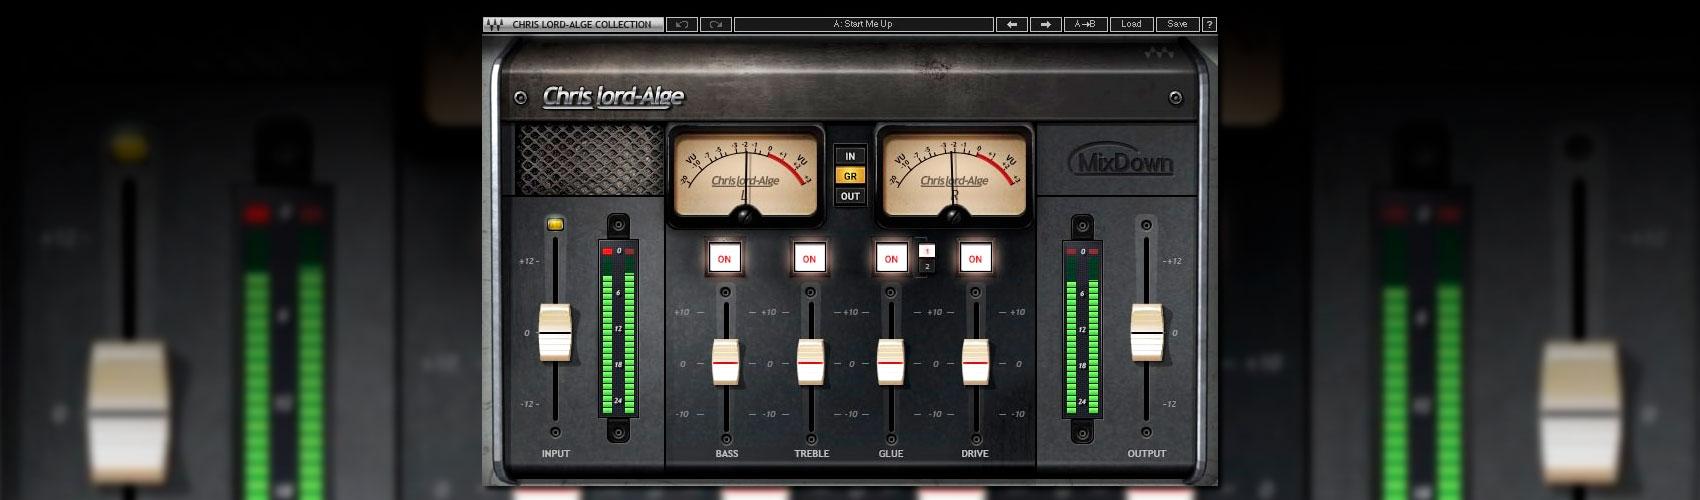 cla-mixdown-waves-audio